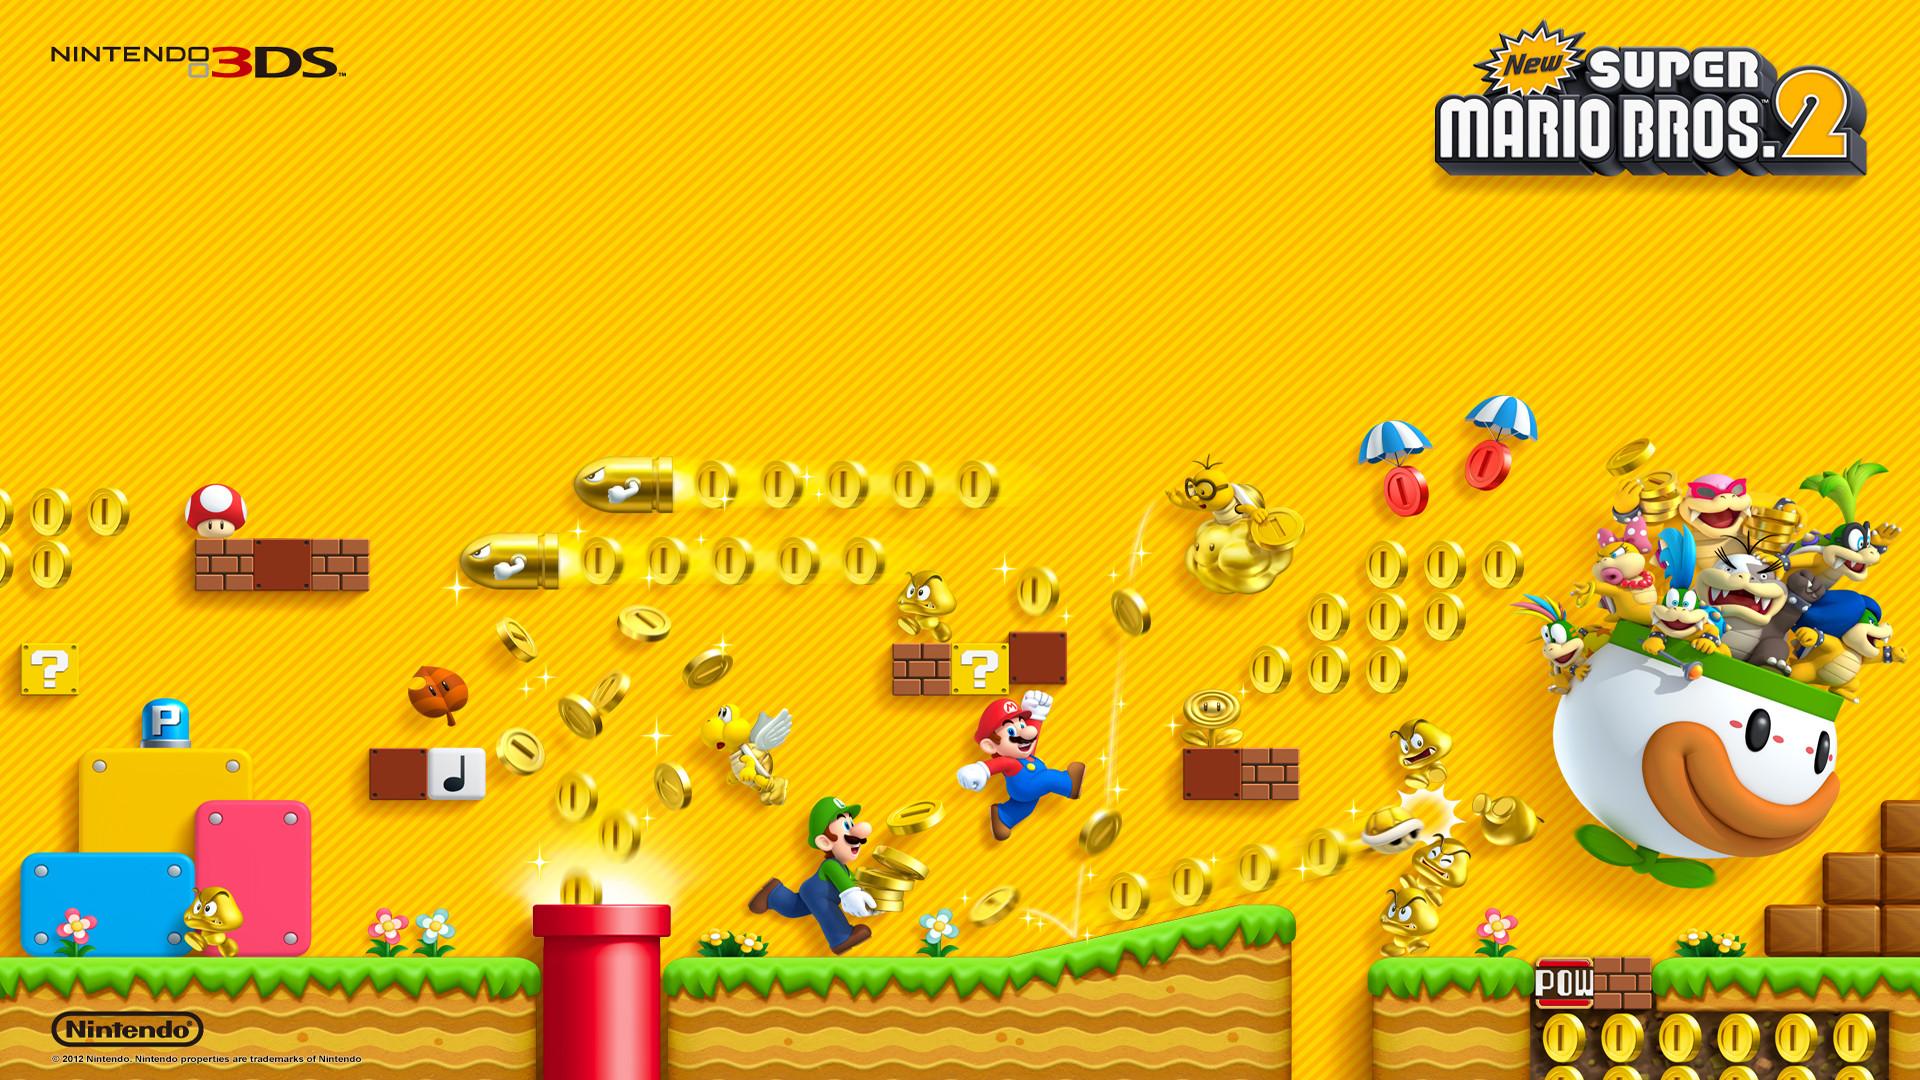 Super-Mario-Bros-2-Wallpaper-yuiphone-1920×1080-Main-